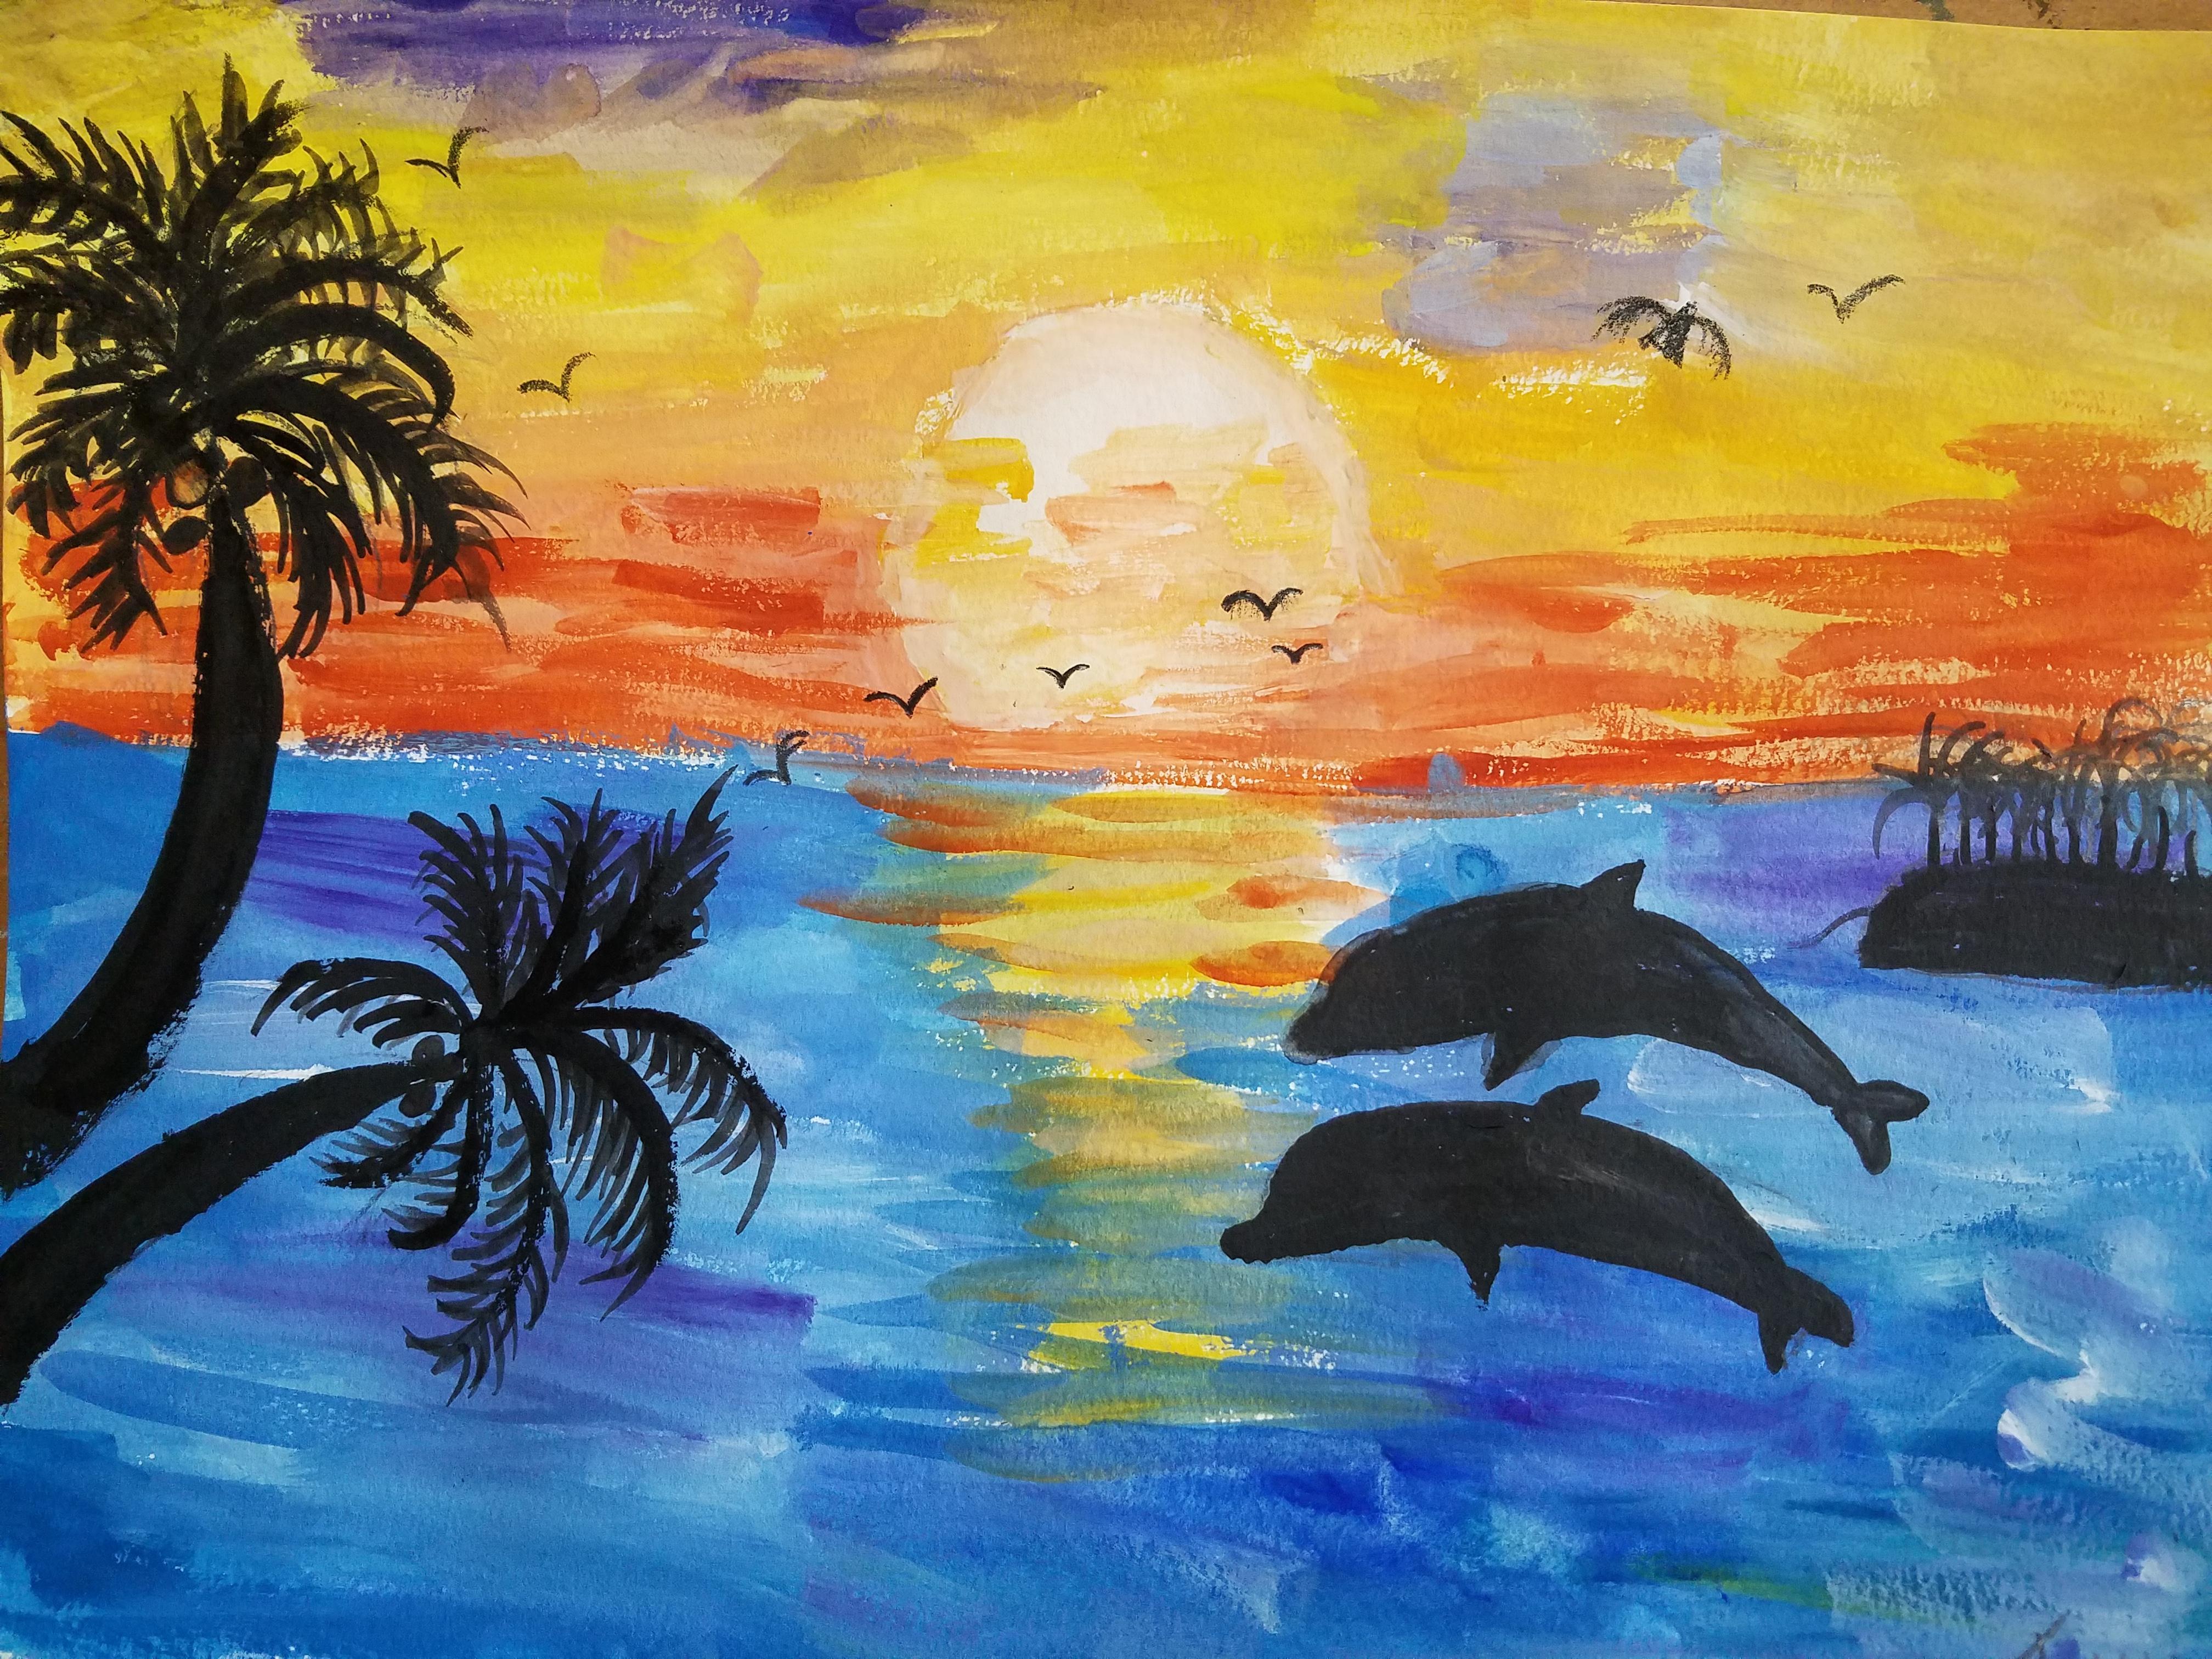 Dolphin Art - Age 11